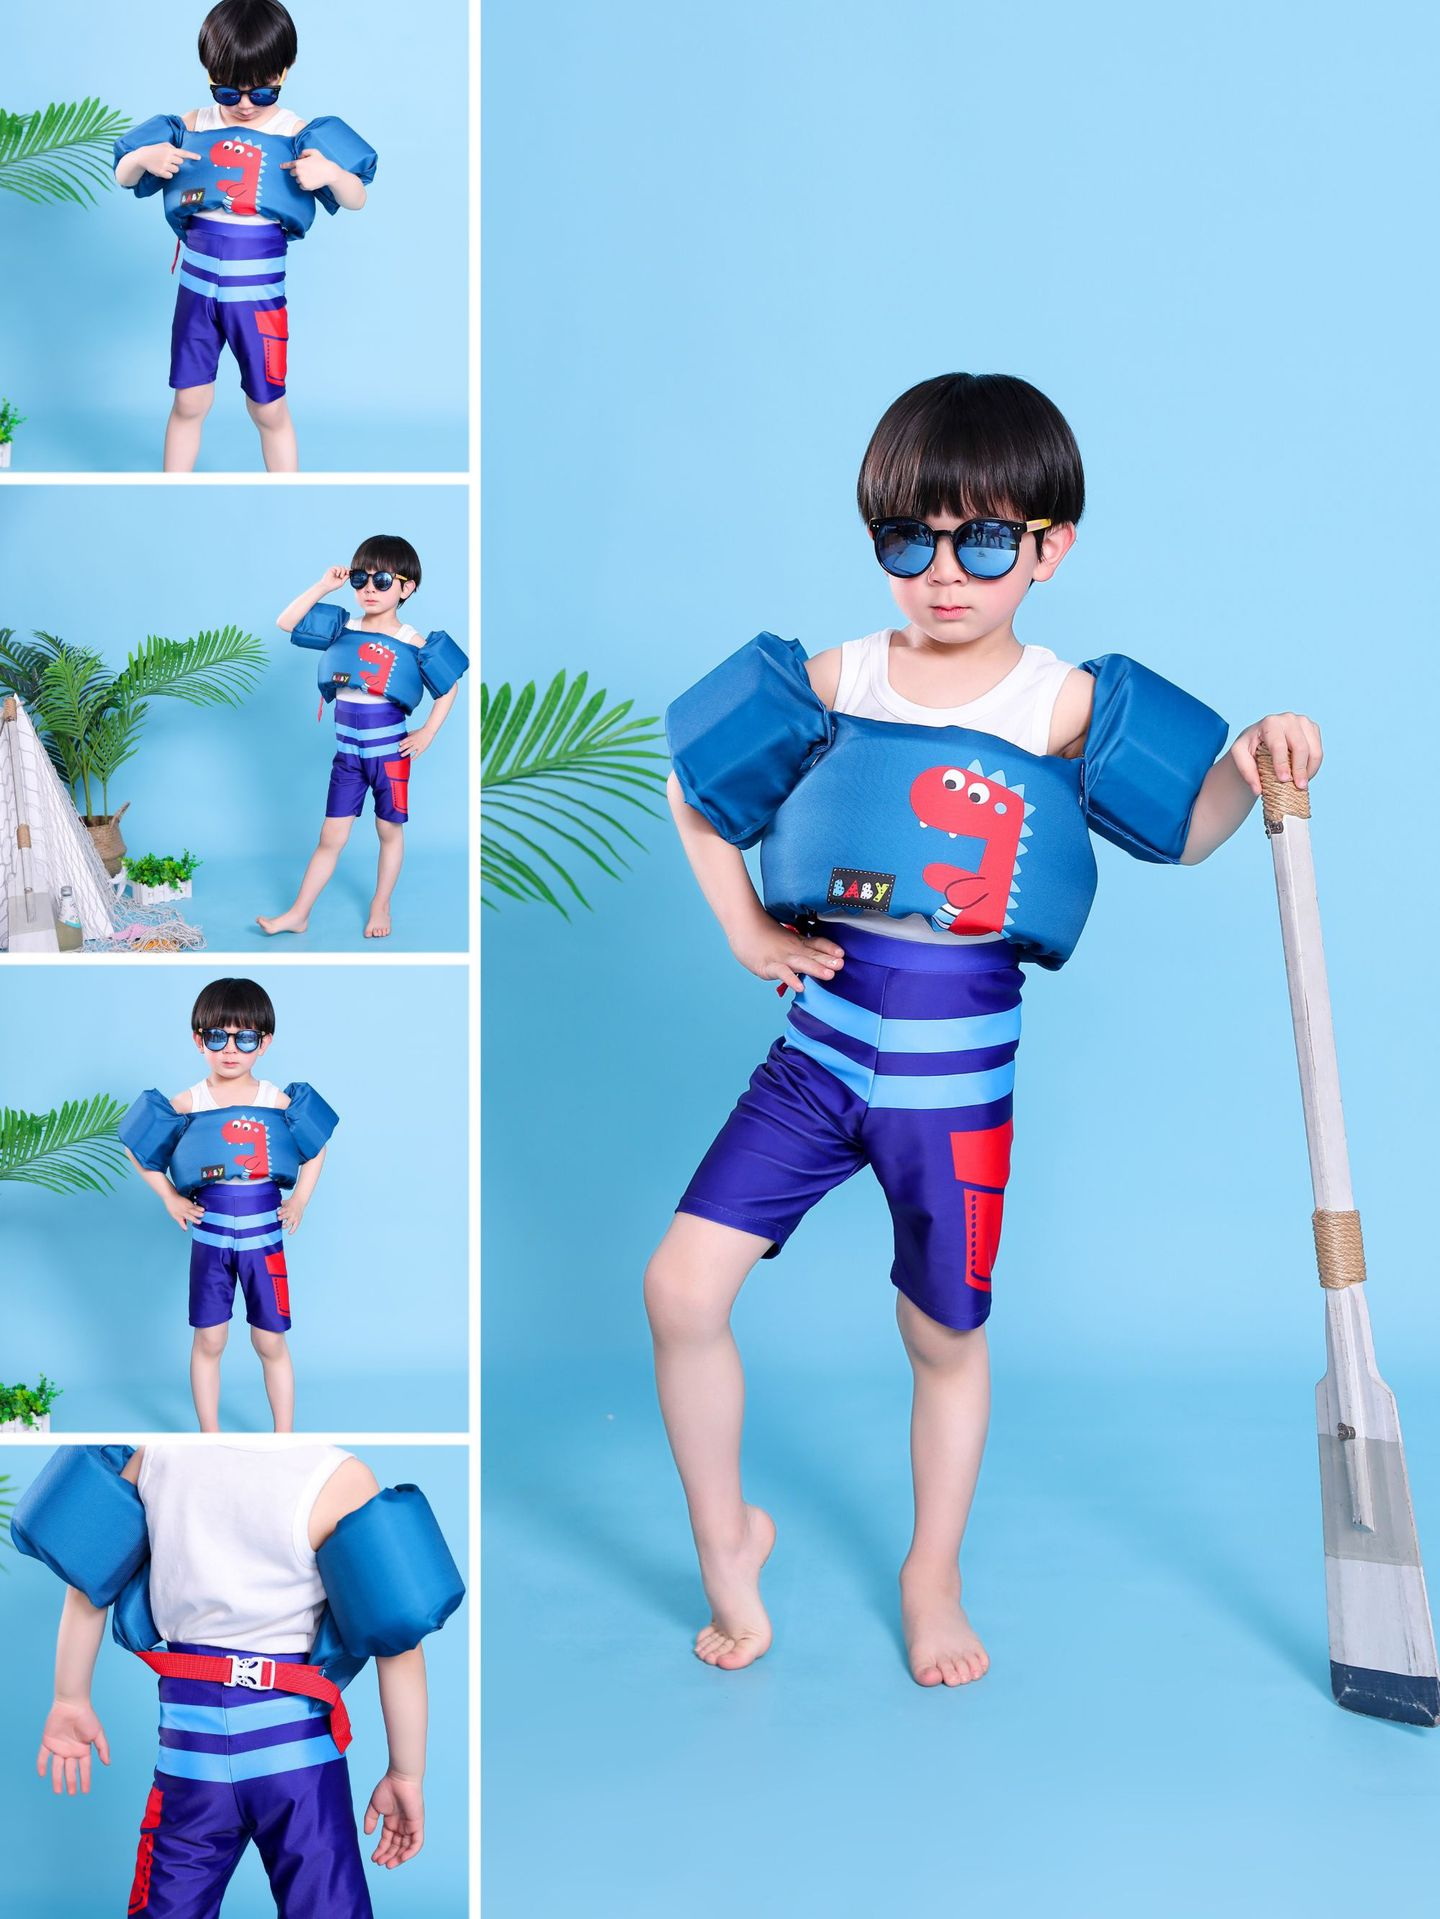 Children s life jacket buoyancy vest baby floating suit swimming arm foam lifebuoy sleeve WW190417117923